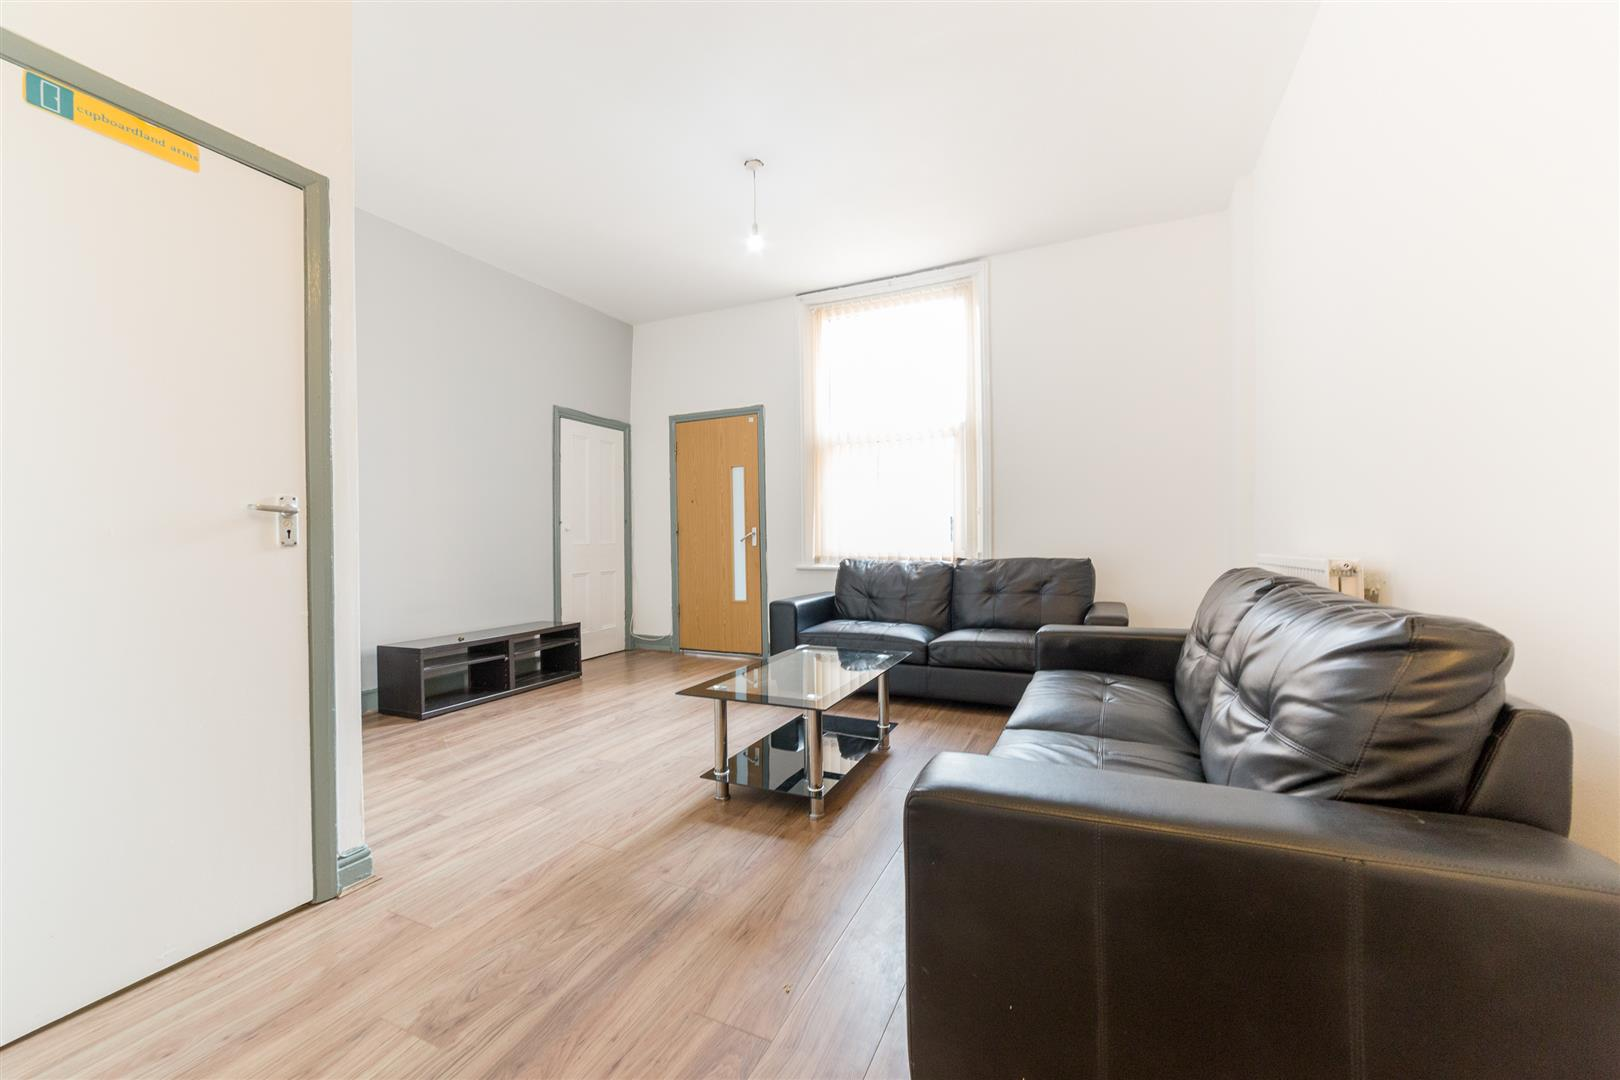 4 bed terraced house to rent in Heaton Road, Heaton, NE6